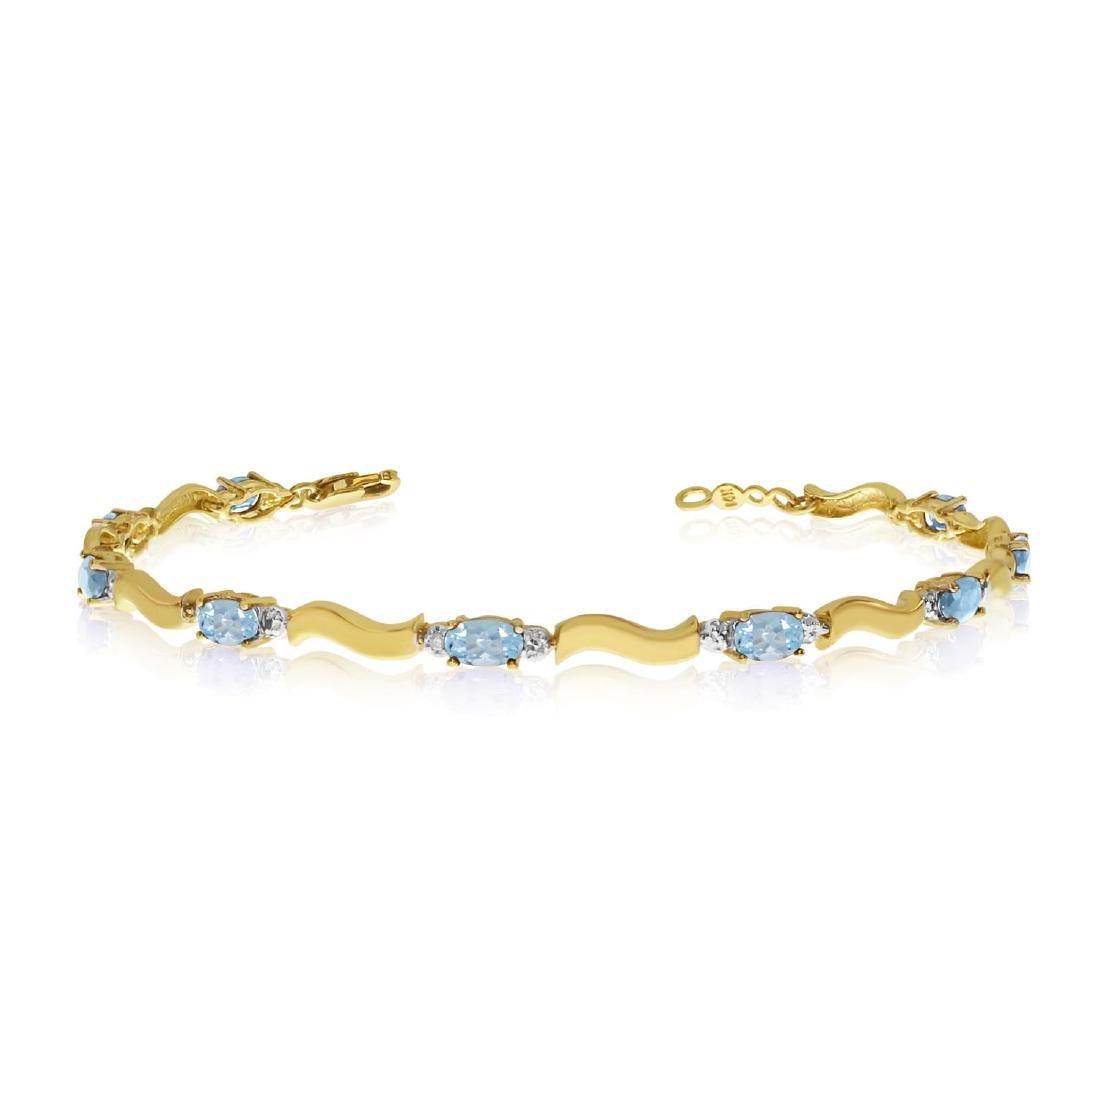 Certified 14K Yellow Gold Oval Aquamarine and Diamond B